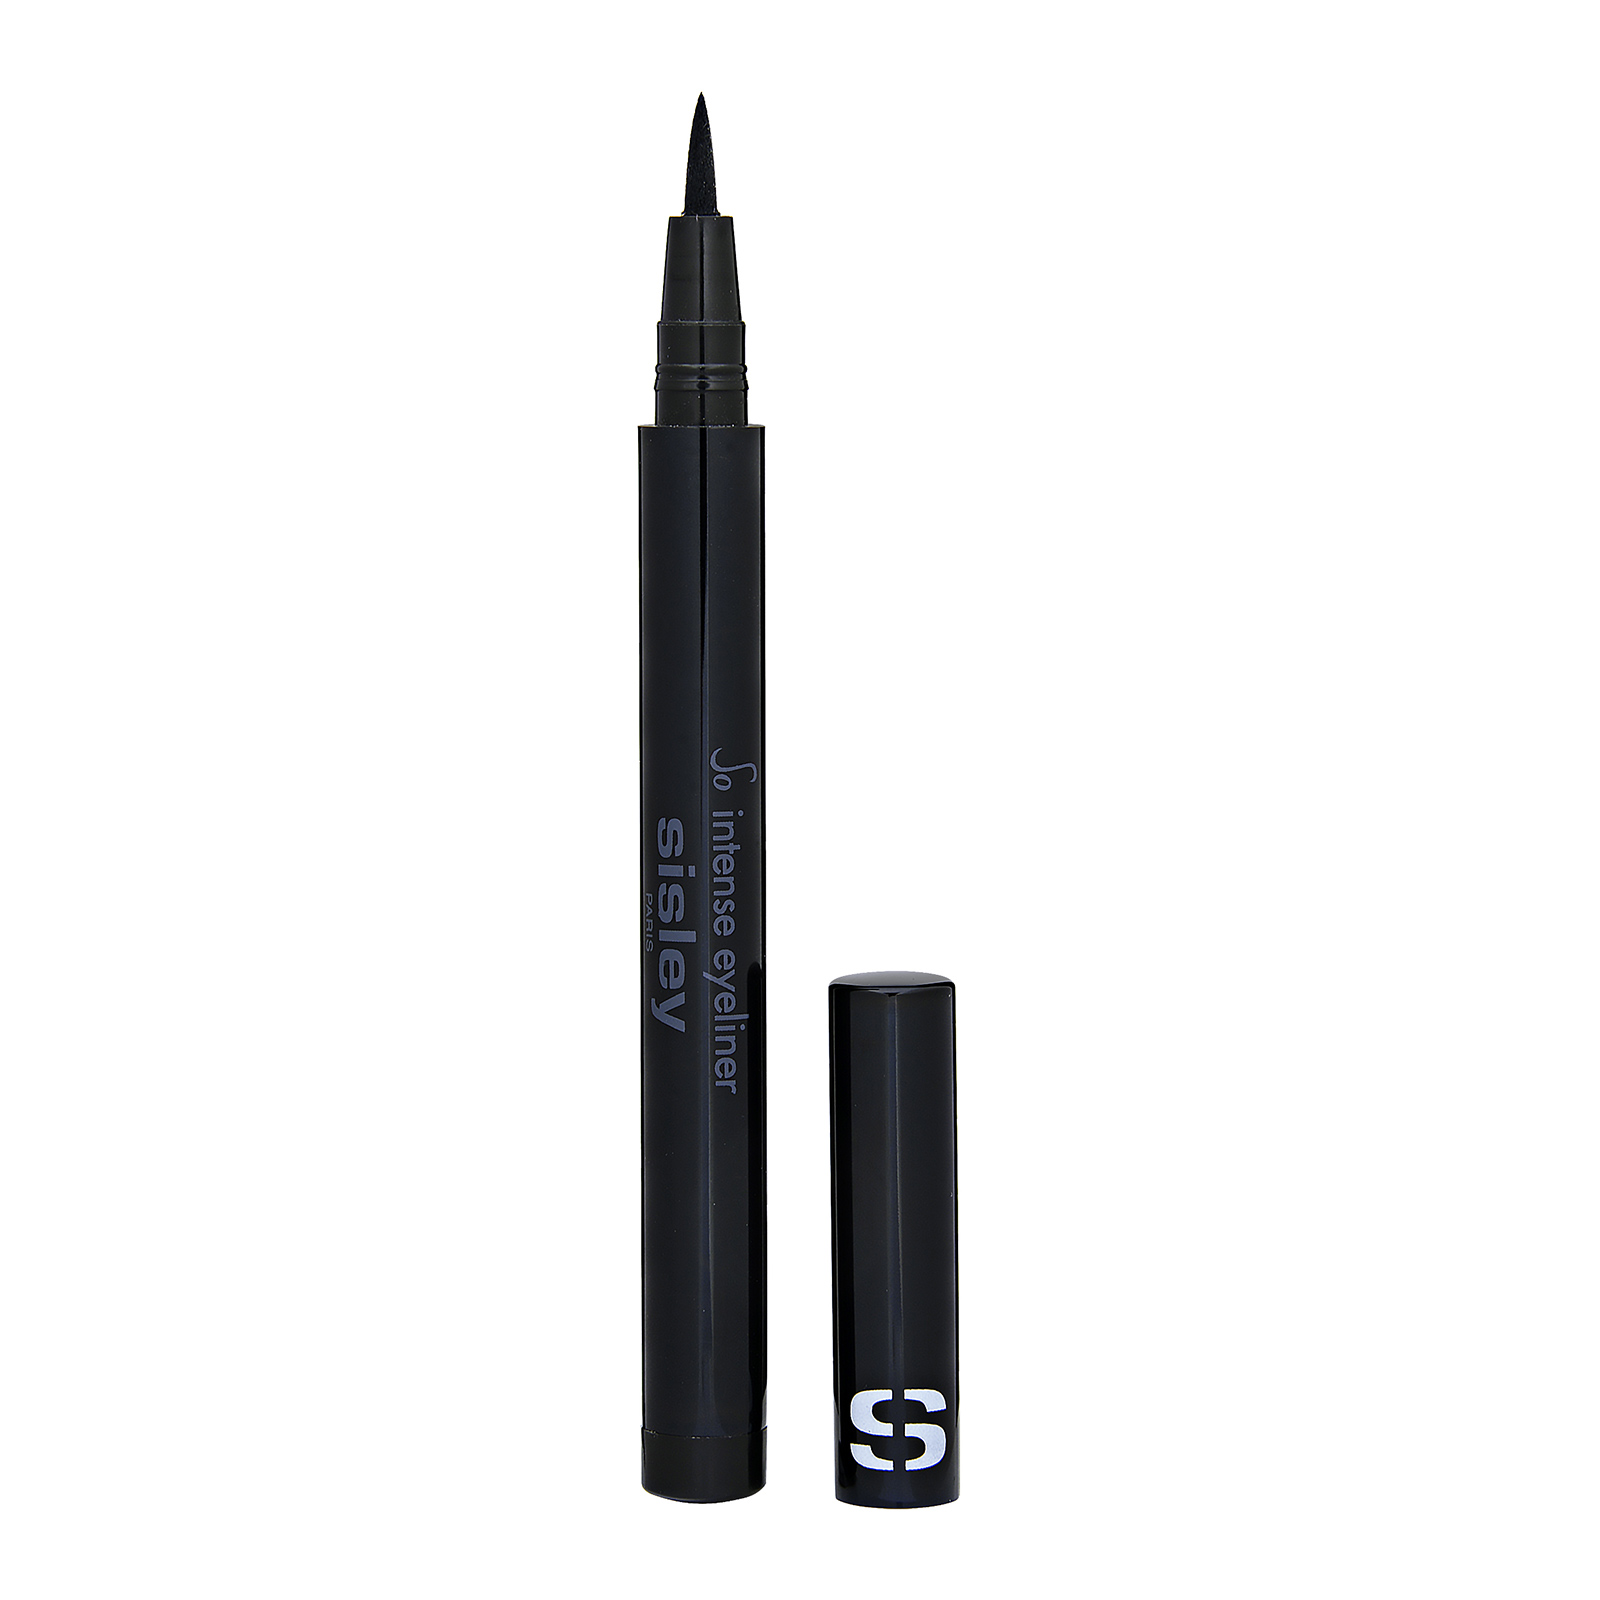 Sisley  So Intense Eyeliner   Deep Black, 0.03oz, 1ml